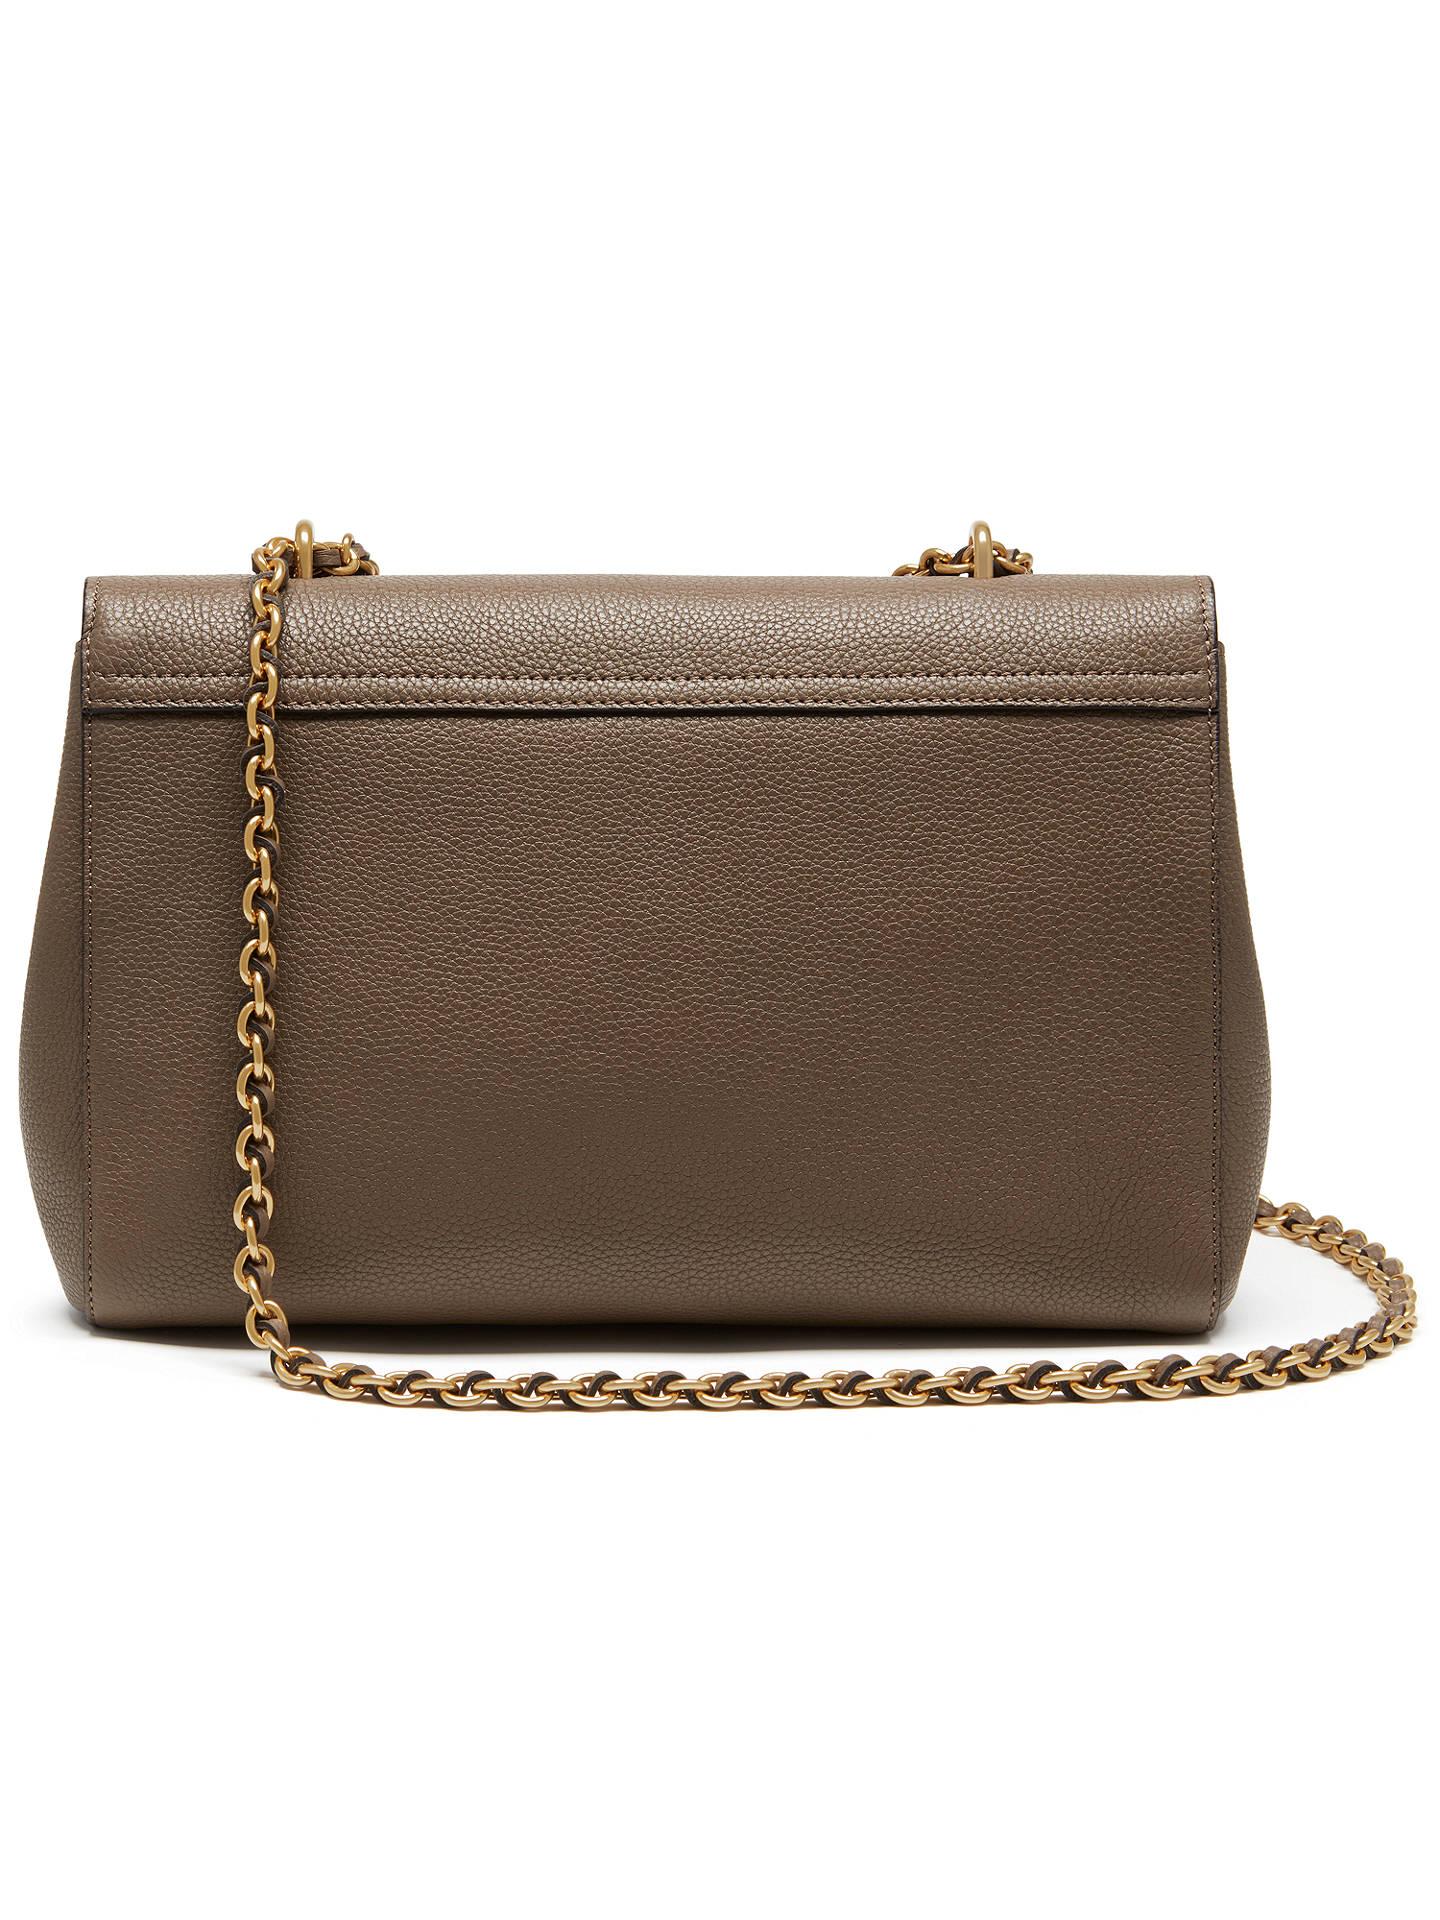 9d0747a278dc Mulberry Medium Lily Leather Shoulder Bag at John Lewis   Partners